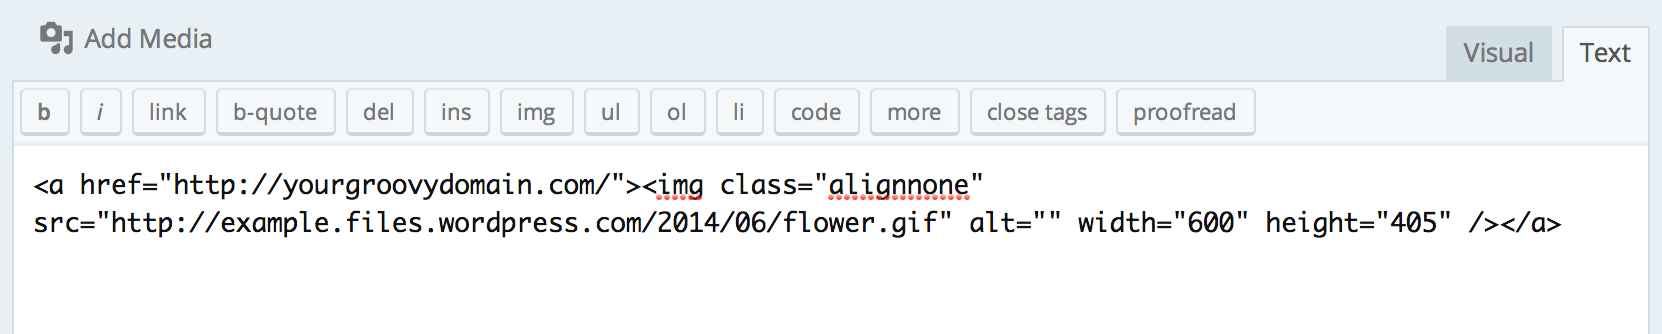 Image Link Code